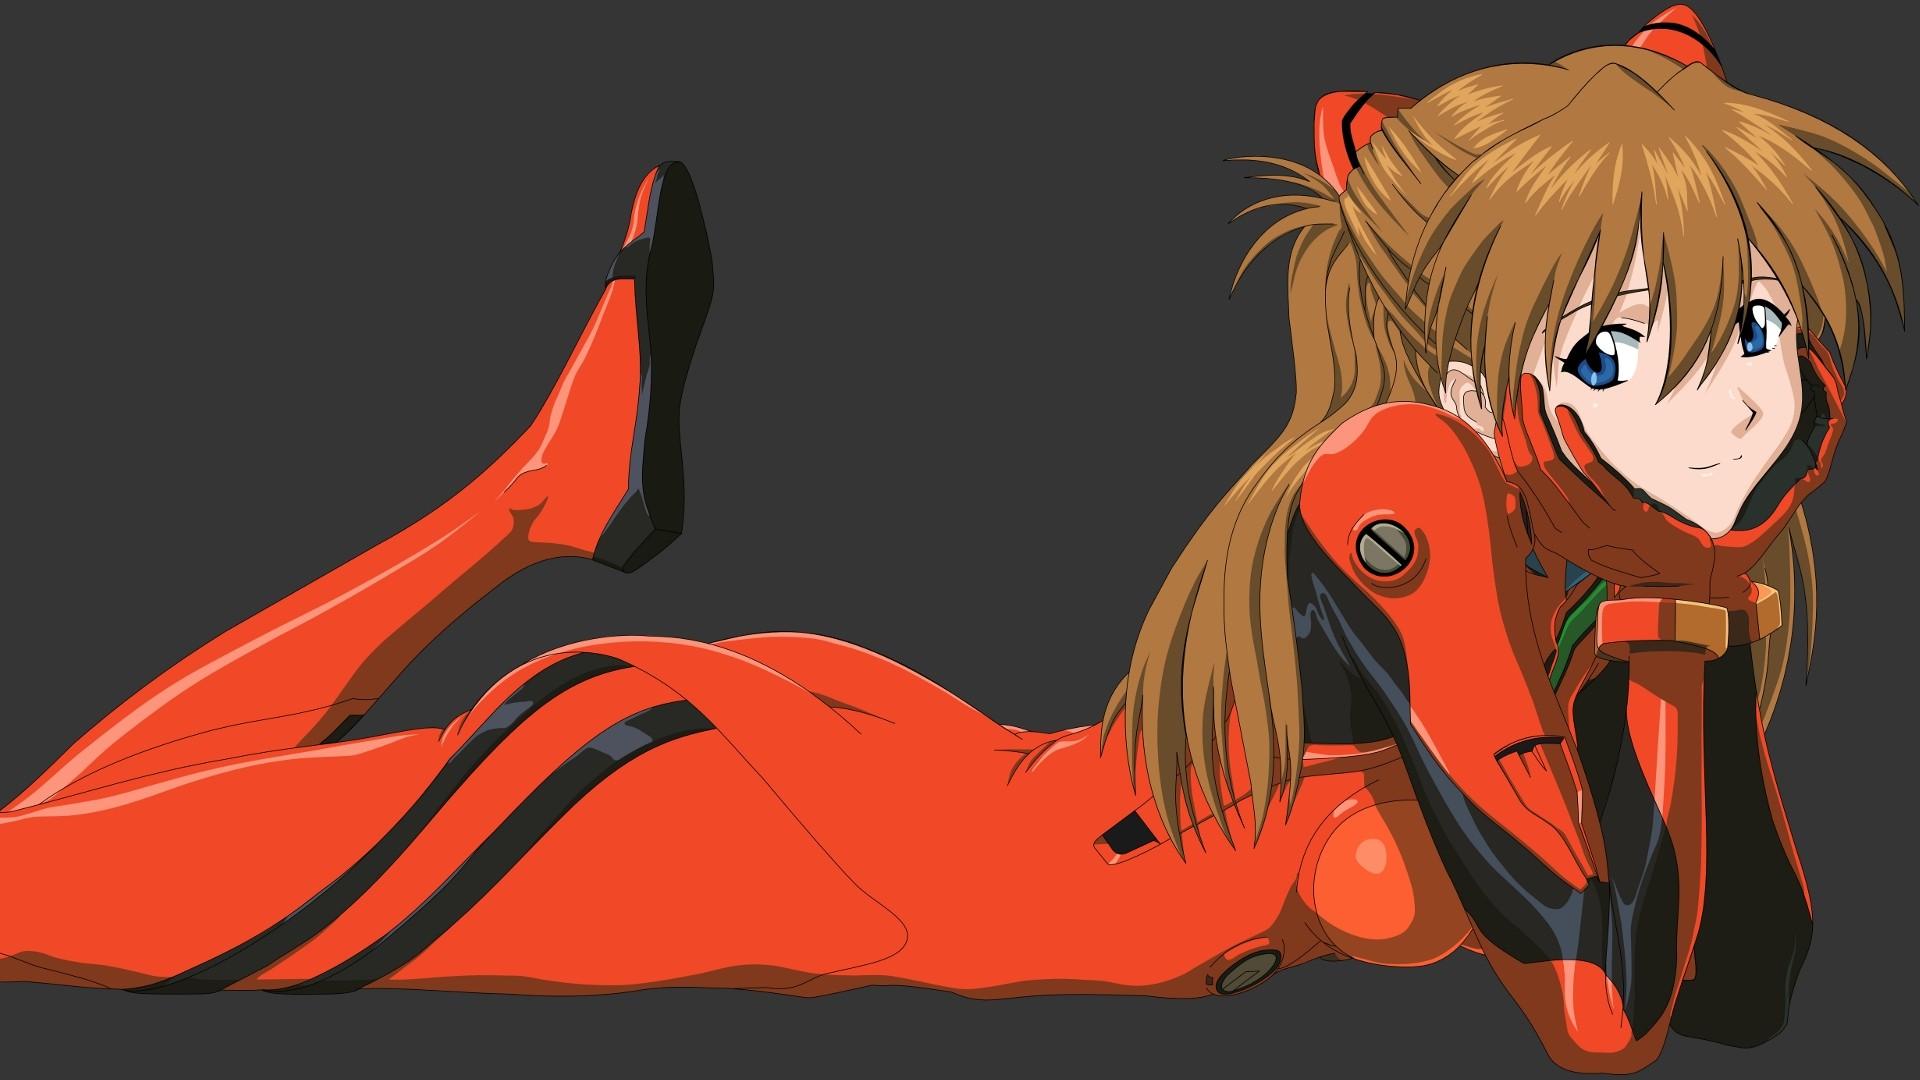 Evangelion Asuka Wallpaper Image